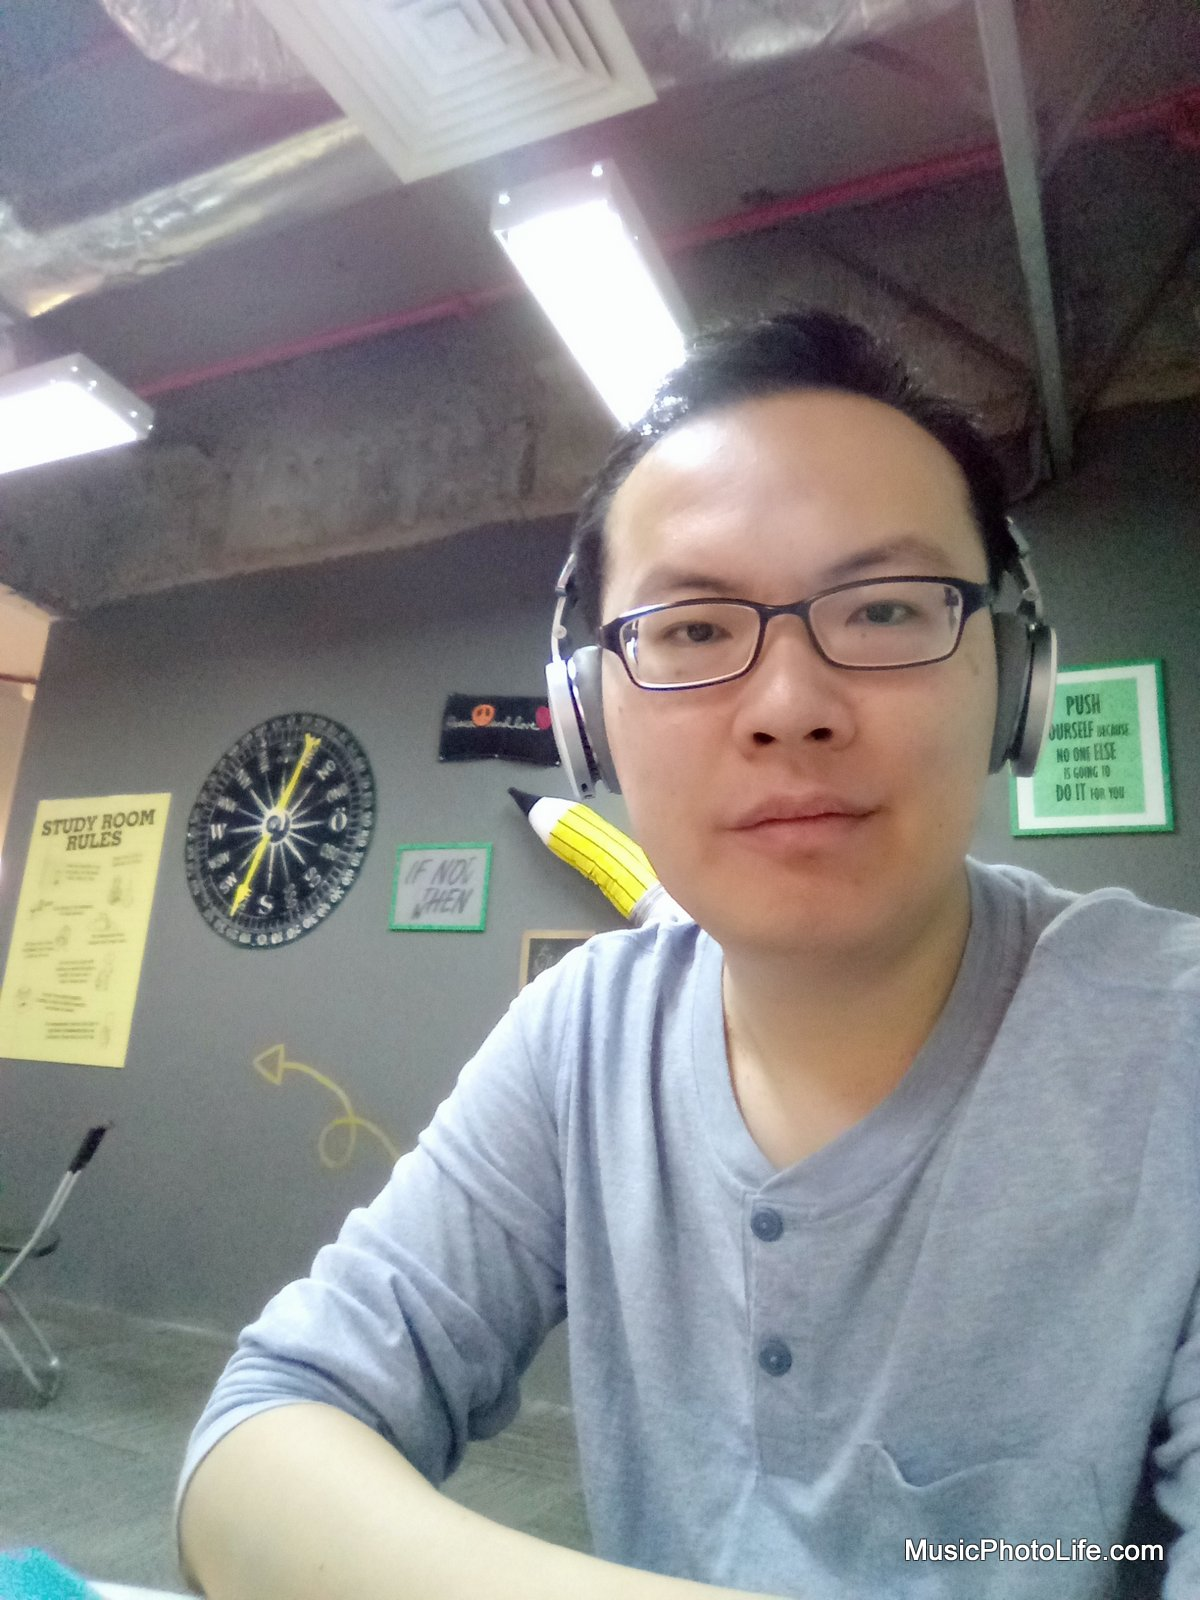 Neffos X1 sample image - selfie